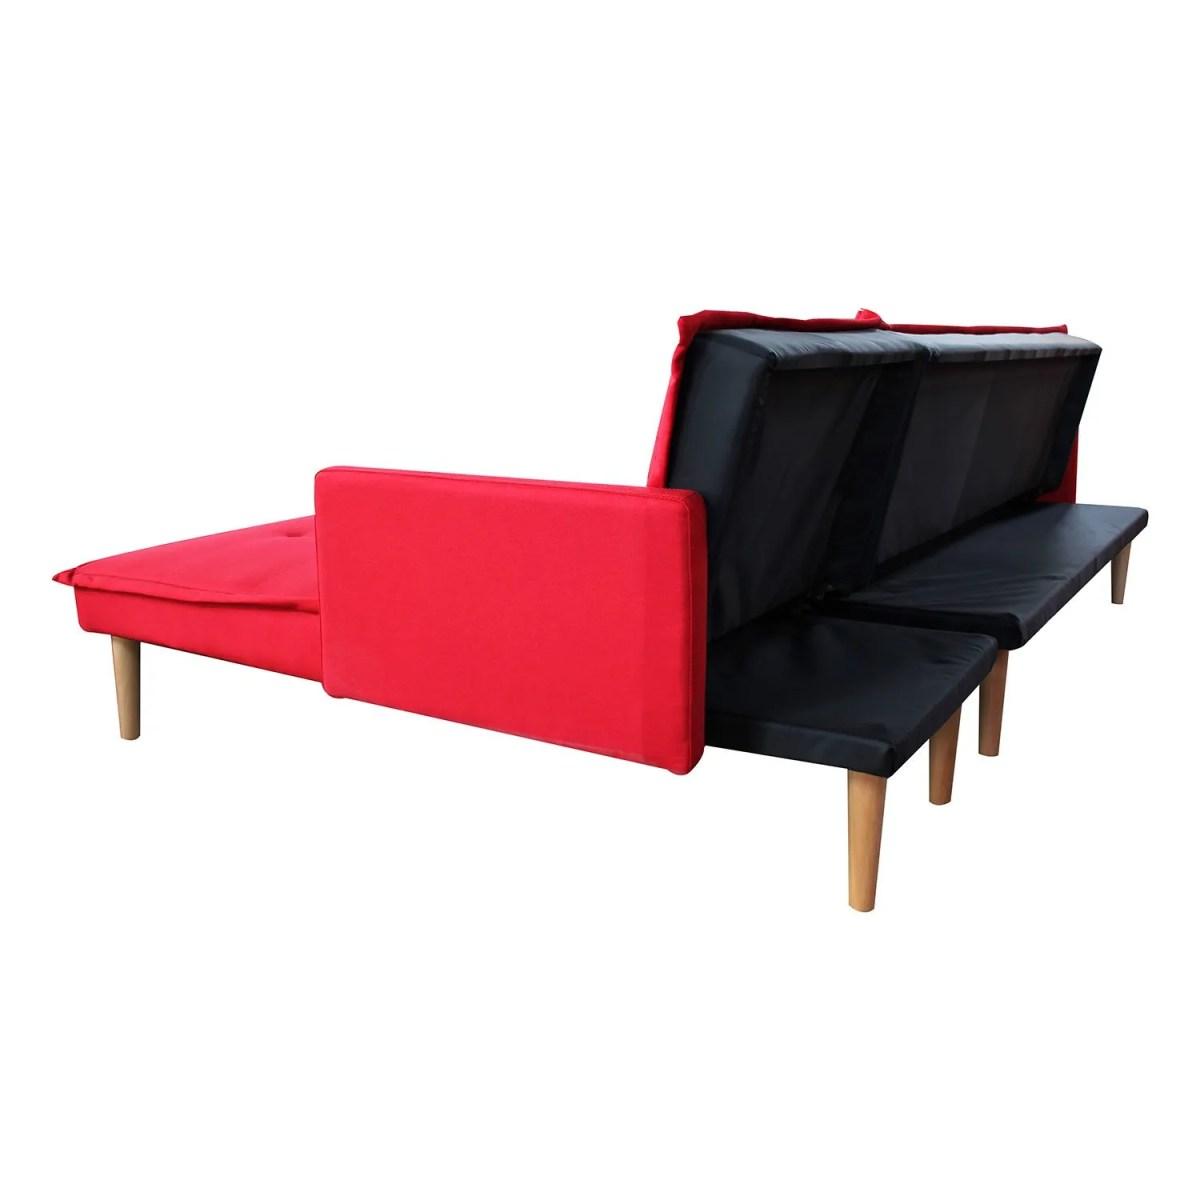 sala esquinada sofá cama independencia rojo 8